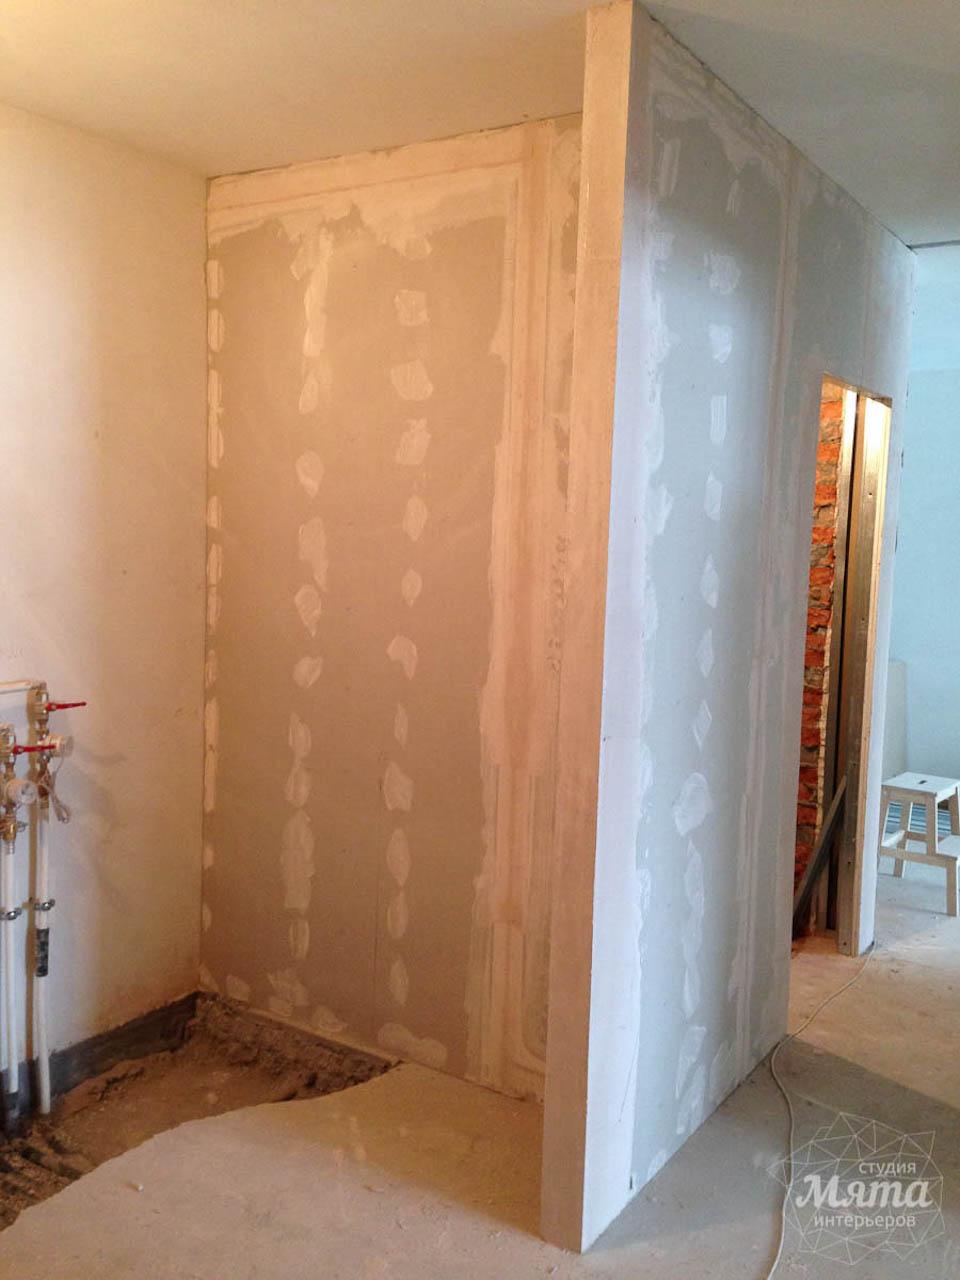 Дизайн интерьера и ремонт трехкомнатной квартиры по ул. Фучика 9 5